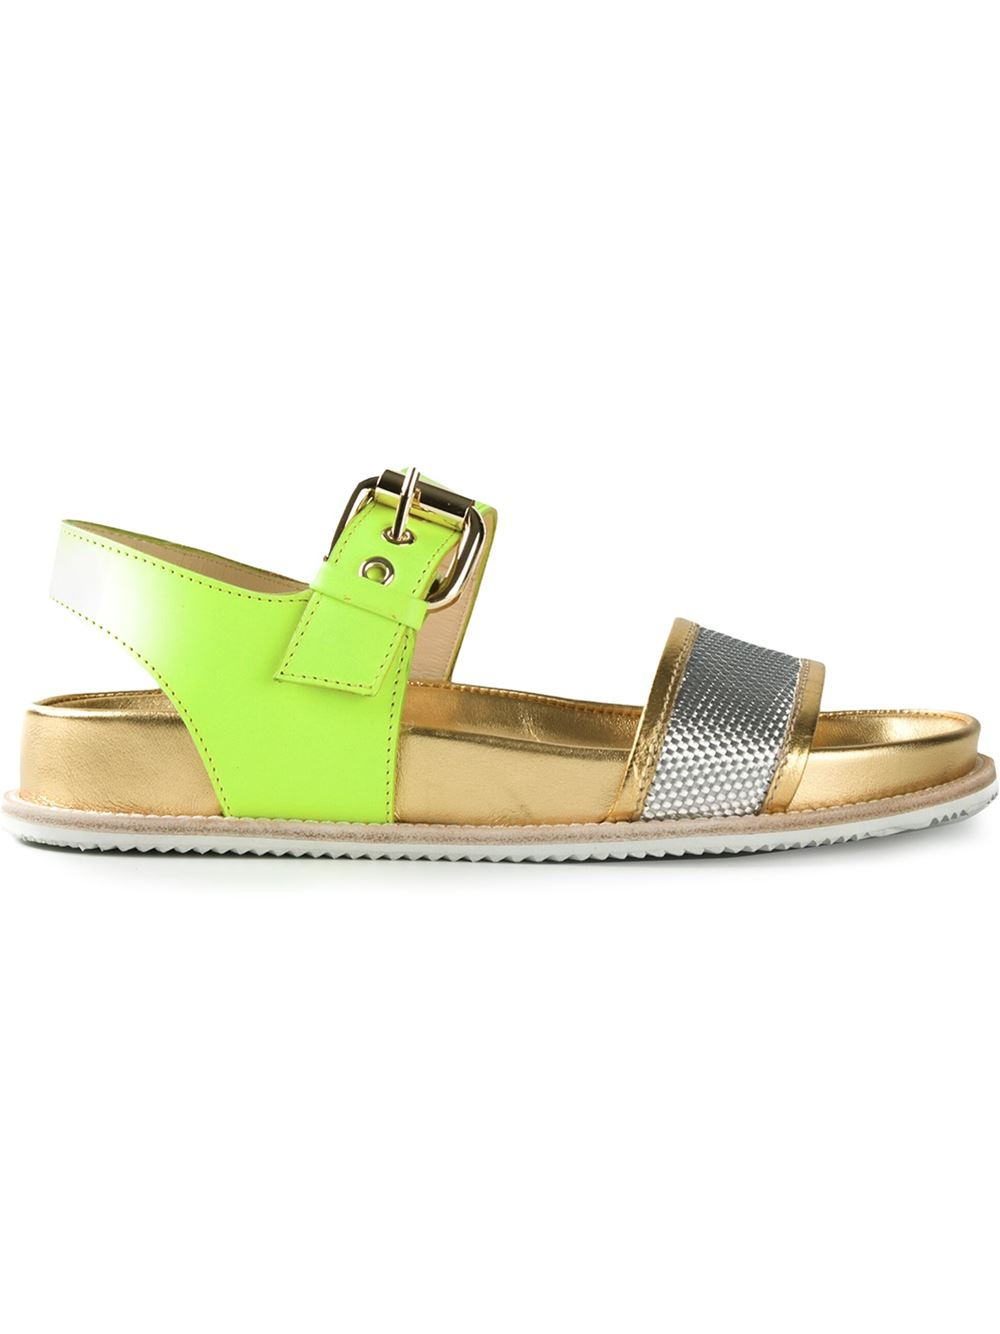 Pollini 'Neon Birk' Sandals in Yellow (yellow & orange)